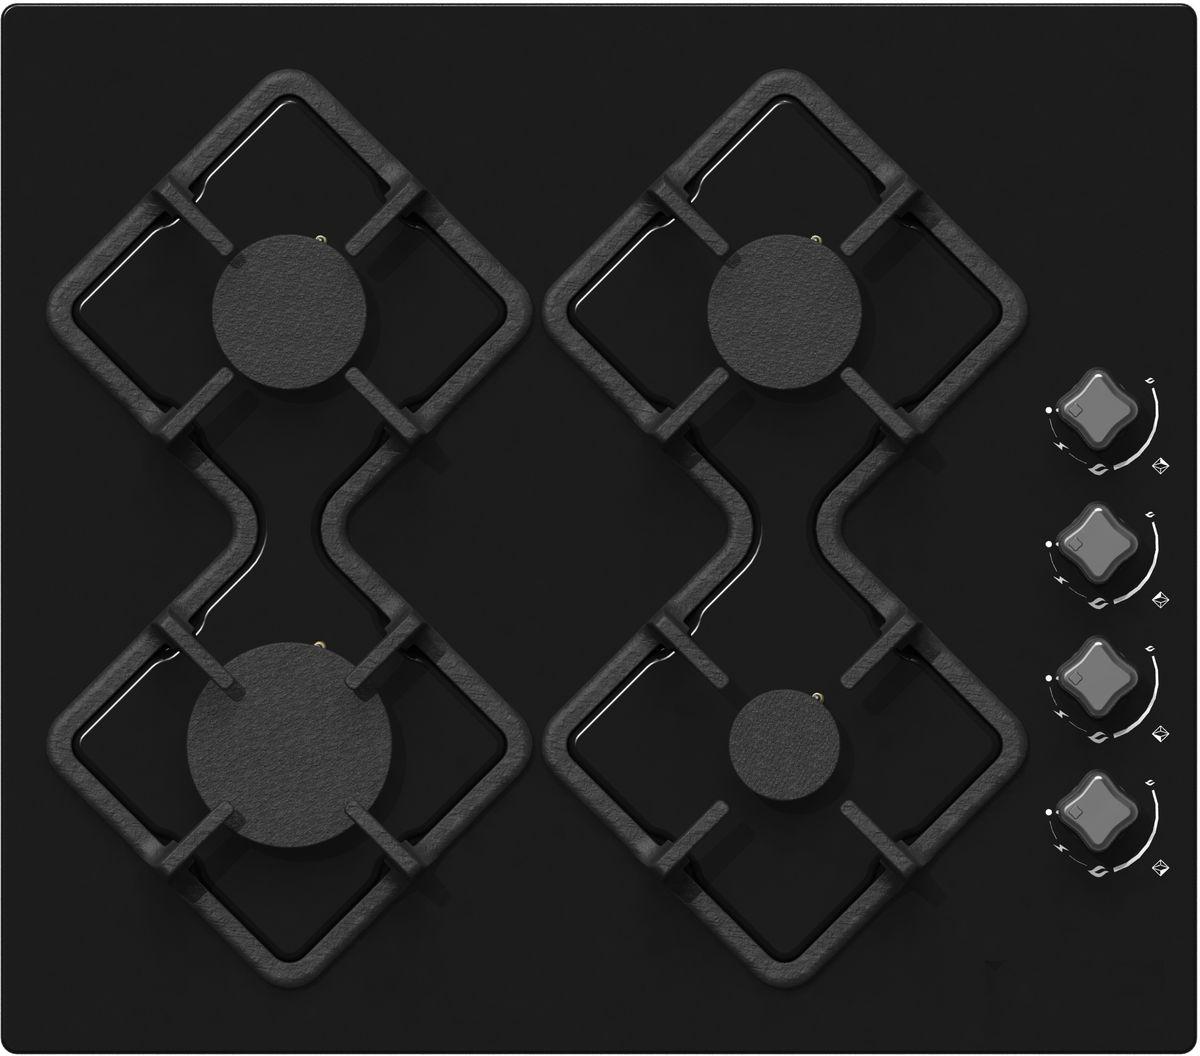 Ricci RGN-KA4007BL, Blackварочная панель встраиваемая Ricci